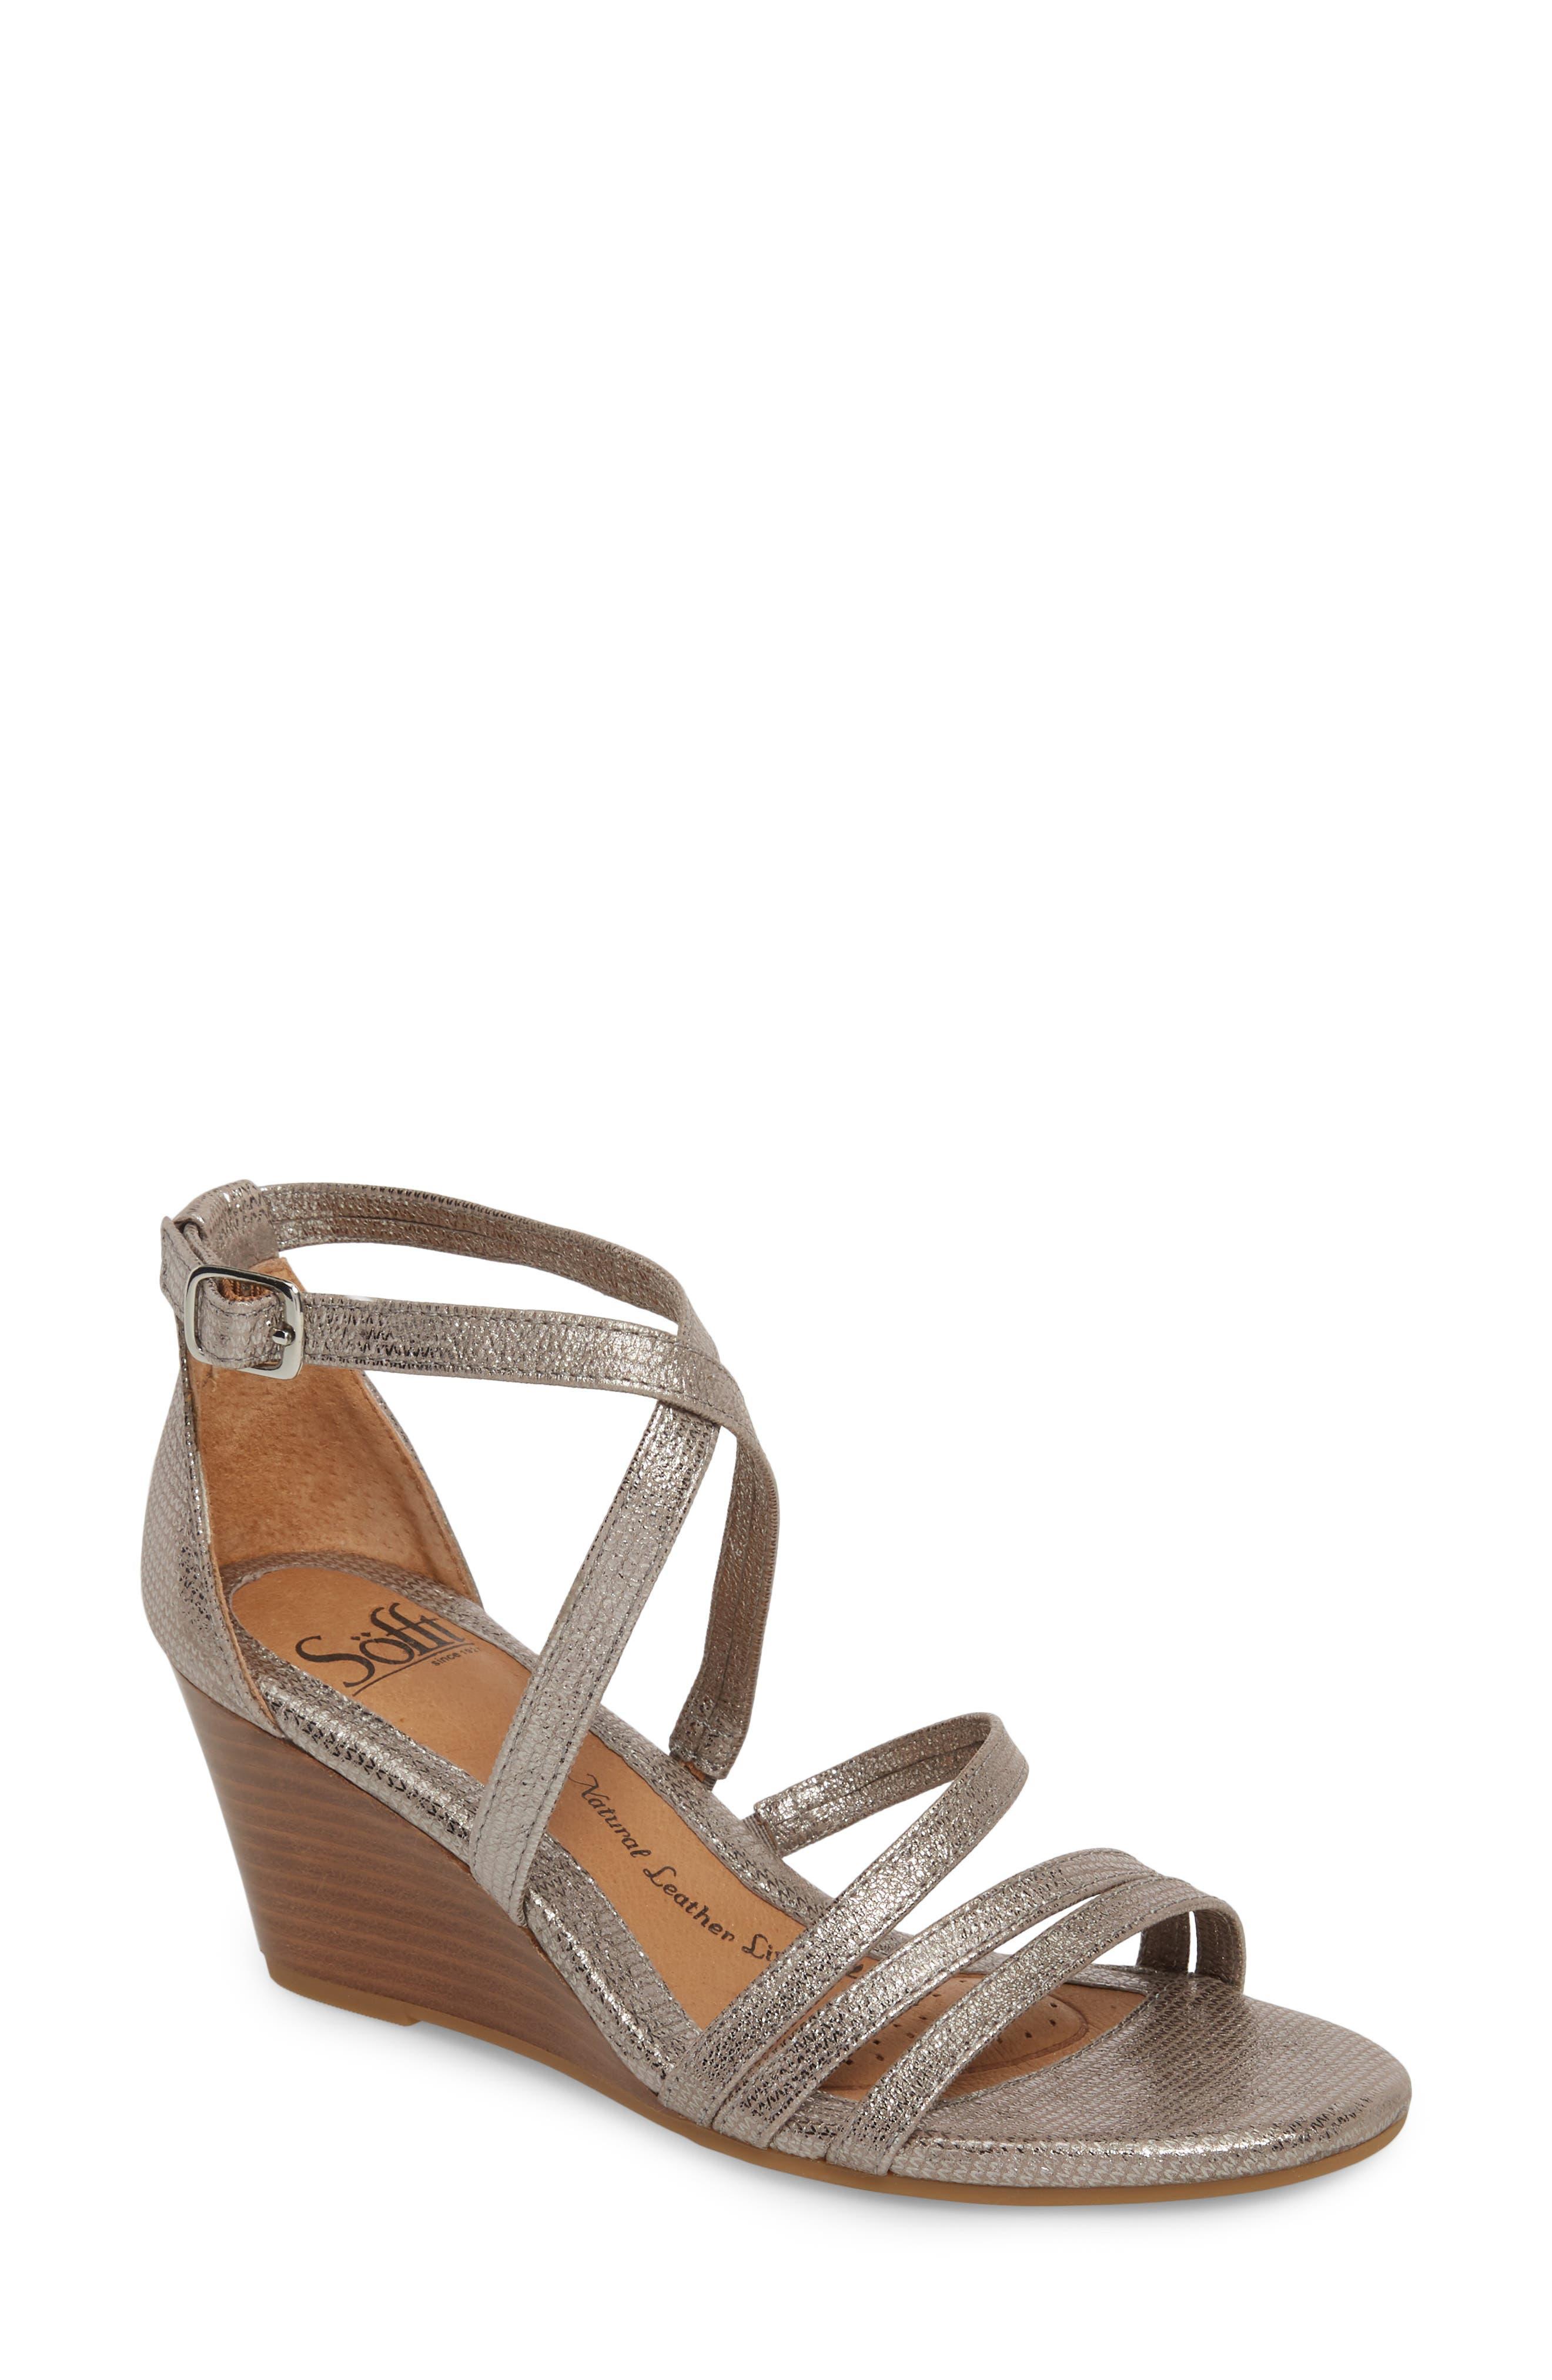 Mecina Wedge Sandal,                             Main thumbnail 1, color,                             Silver Metallic Leather